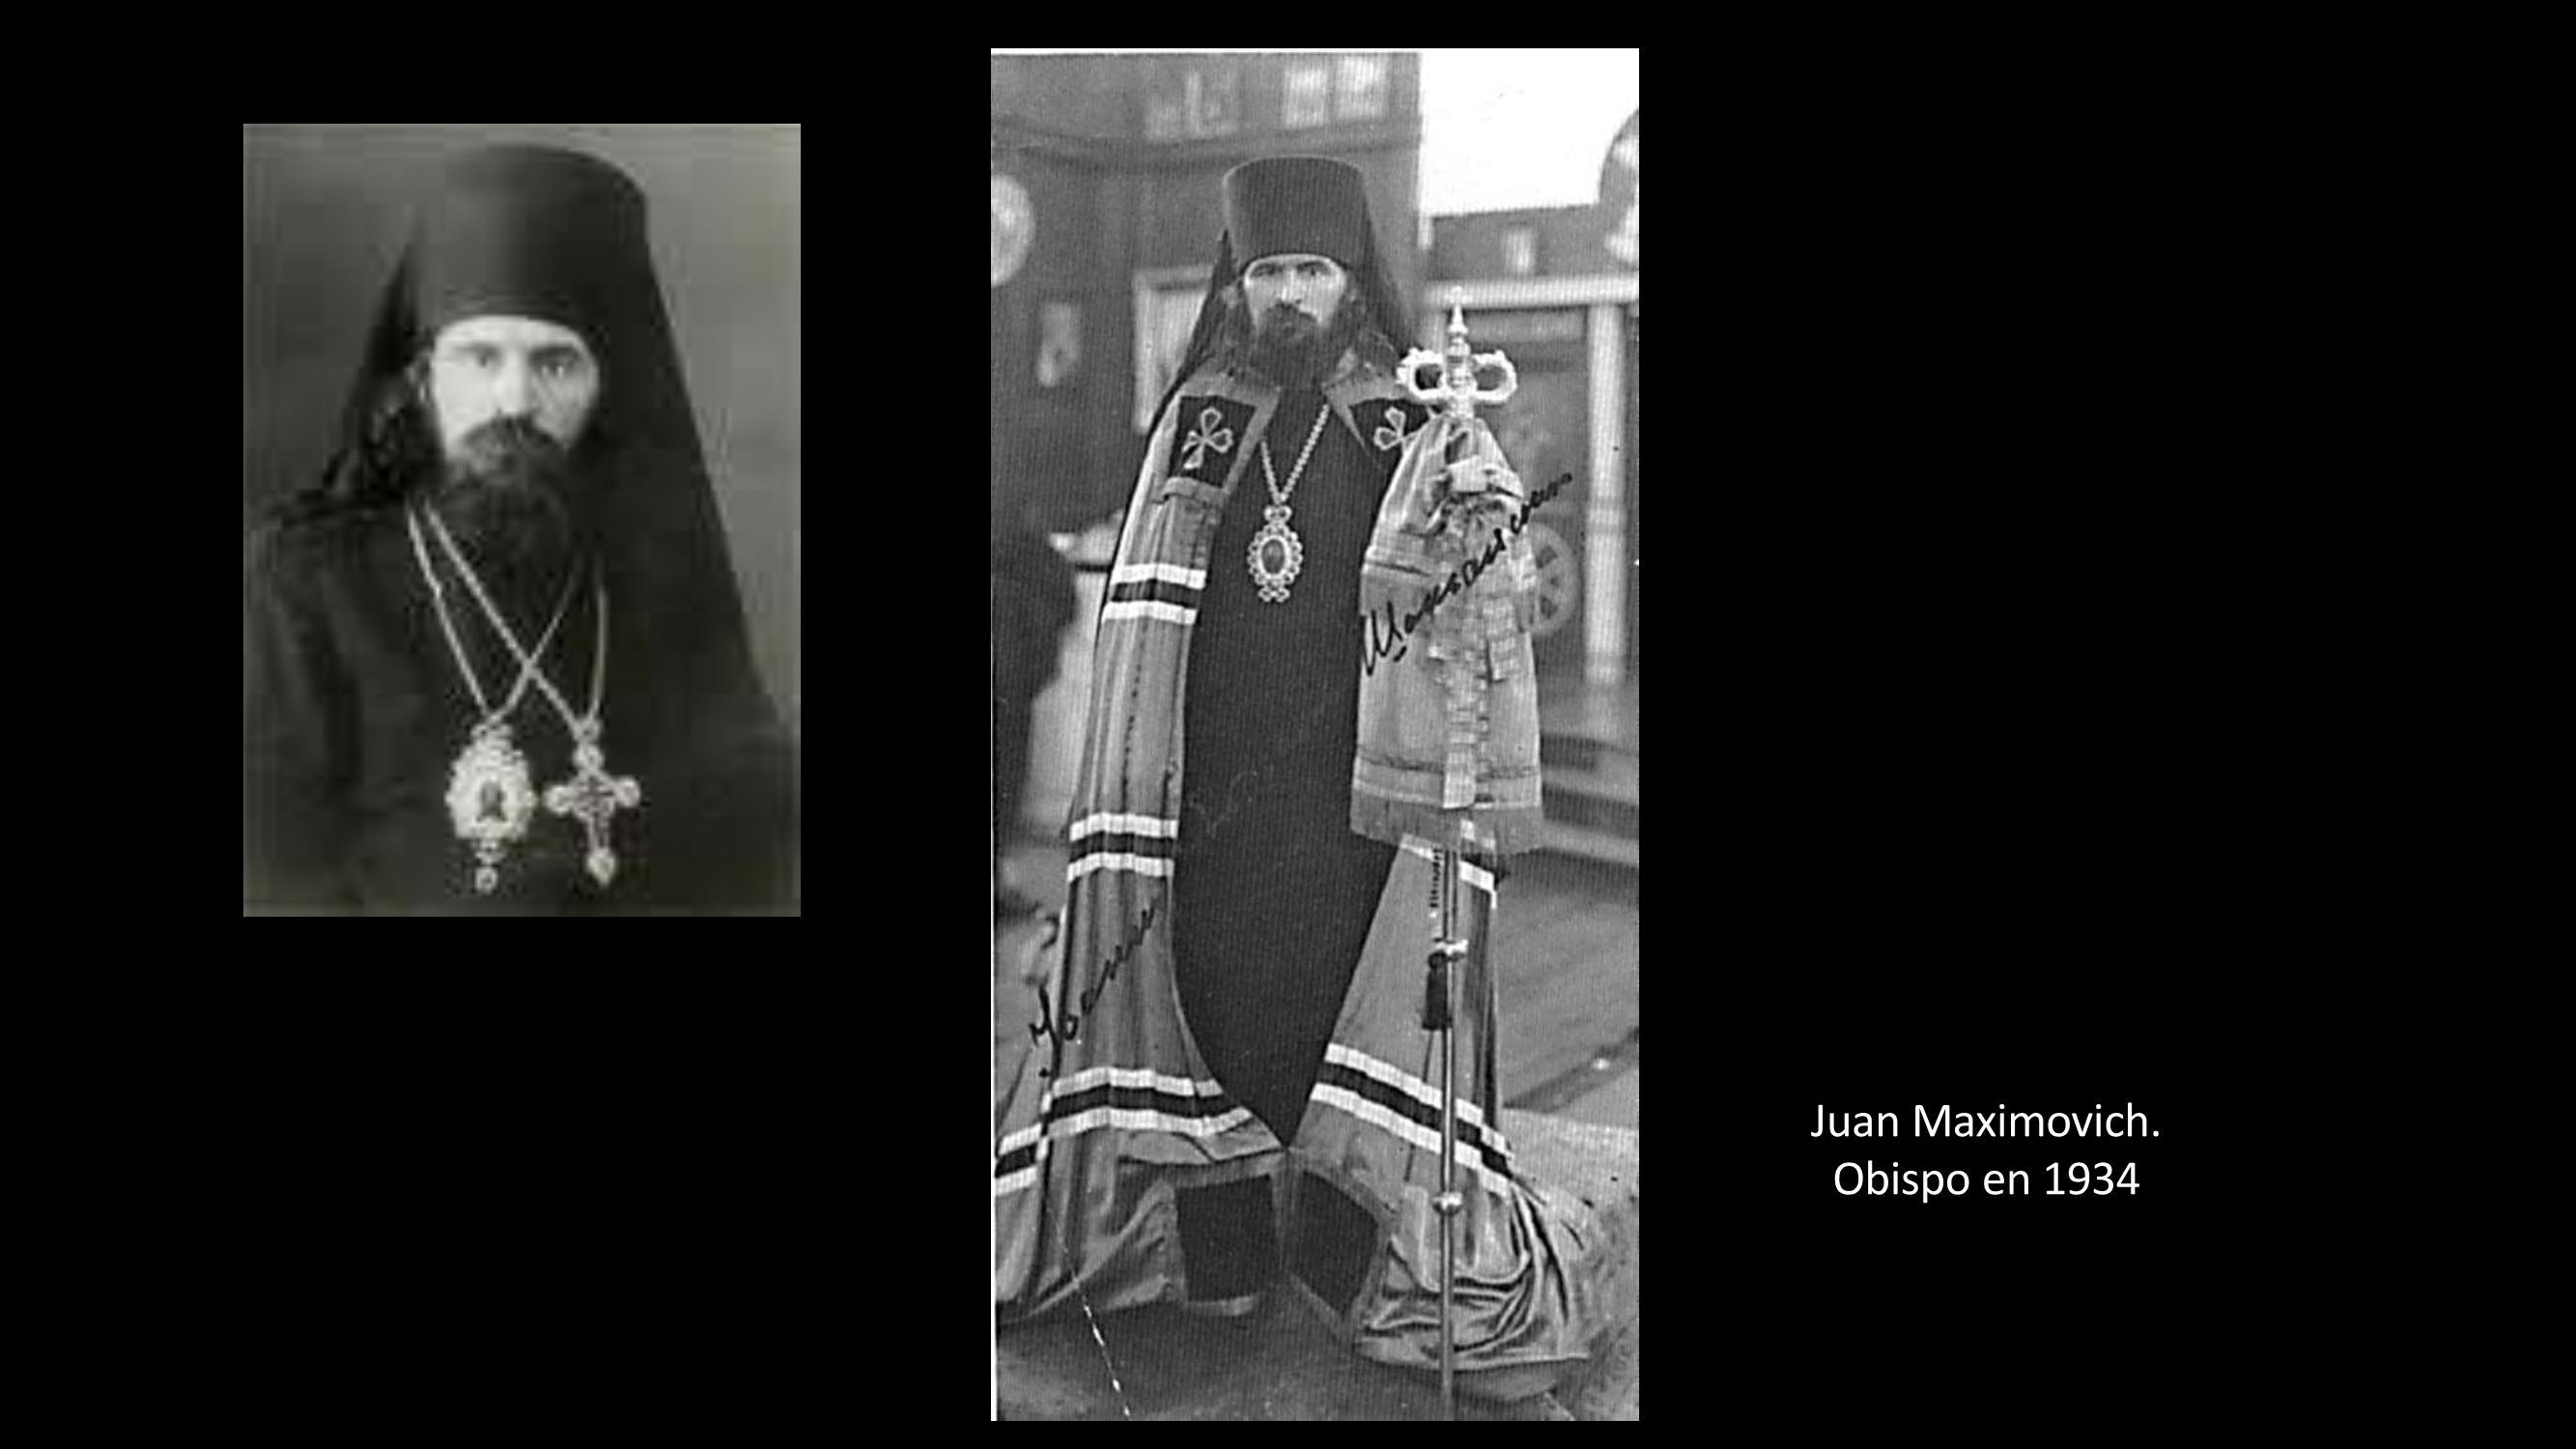 [48] San Juan Maximovich